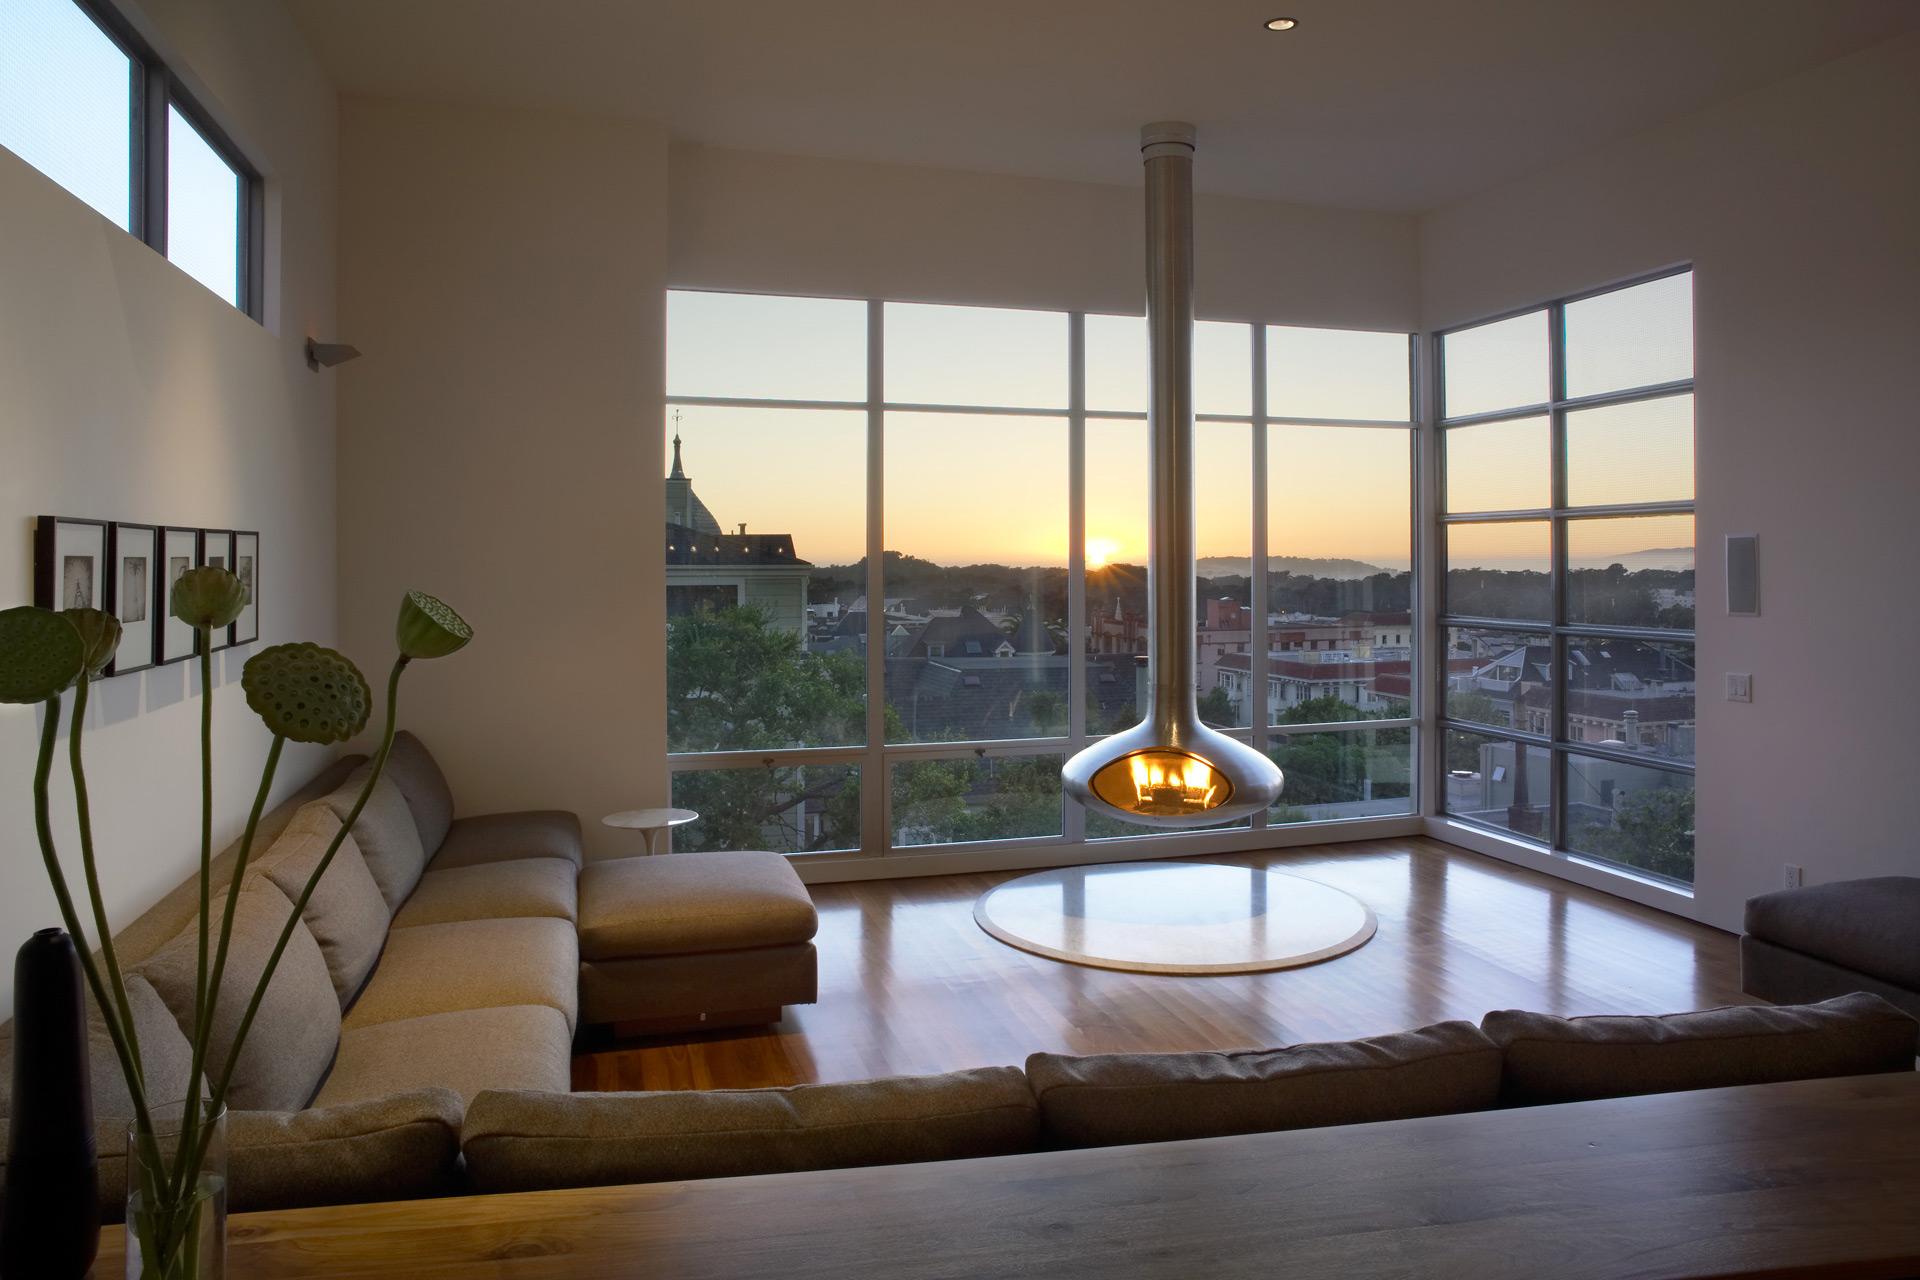 Haus Martin modern home design